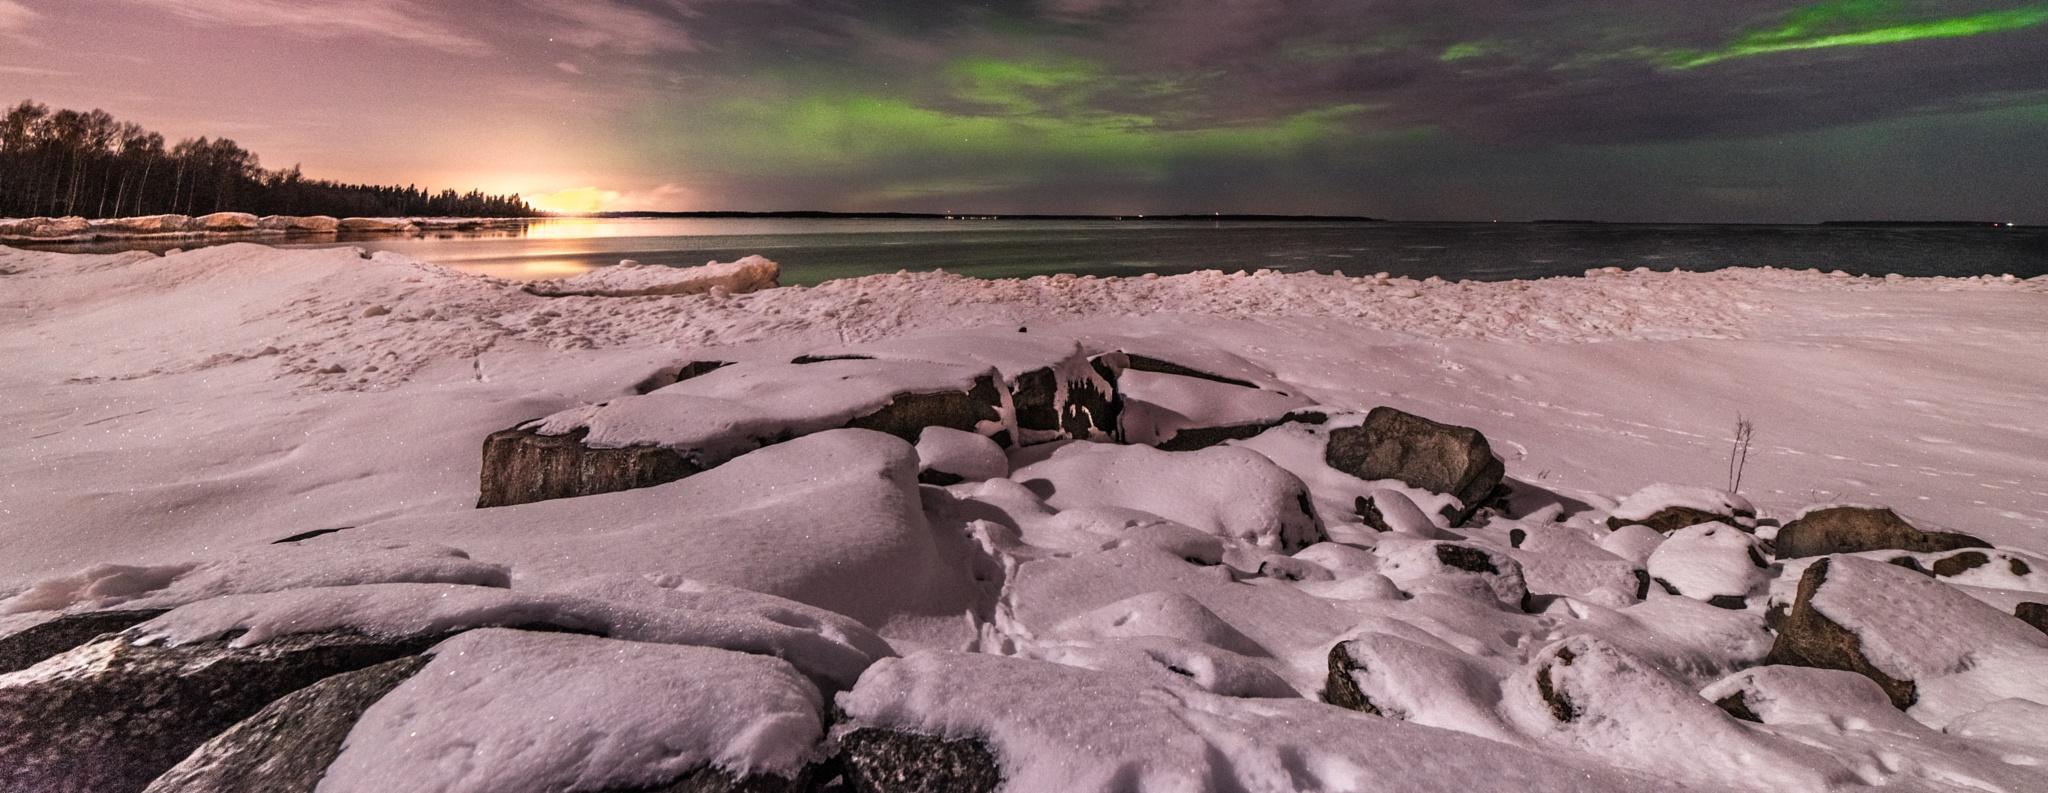 Aurora and Clouds  by Niclaskrog